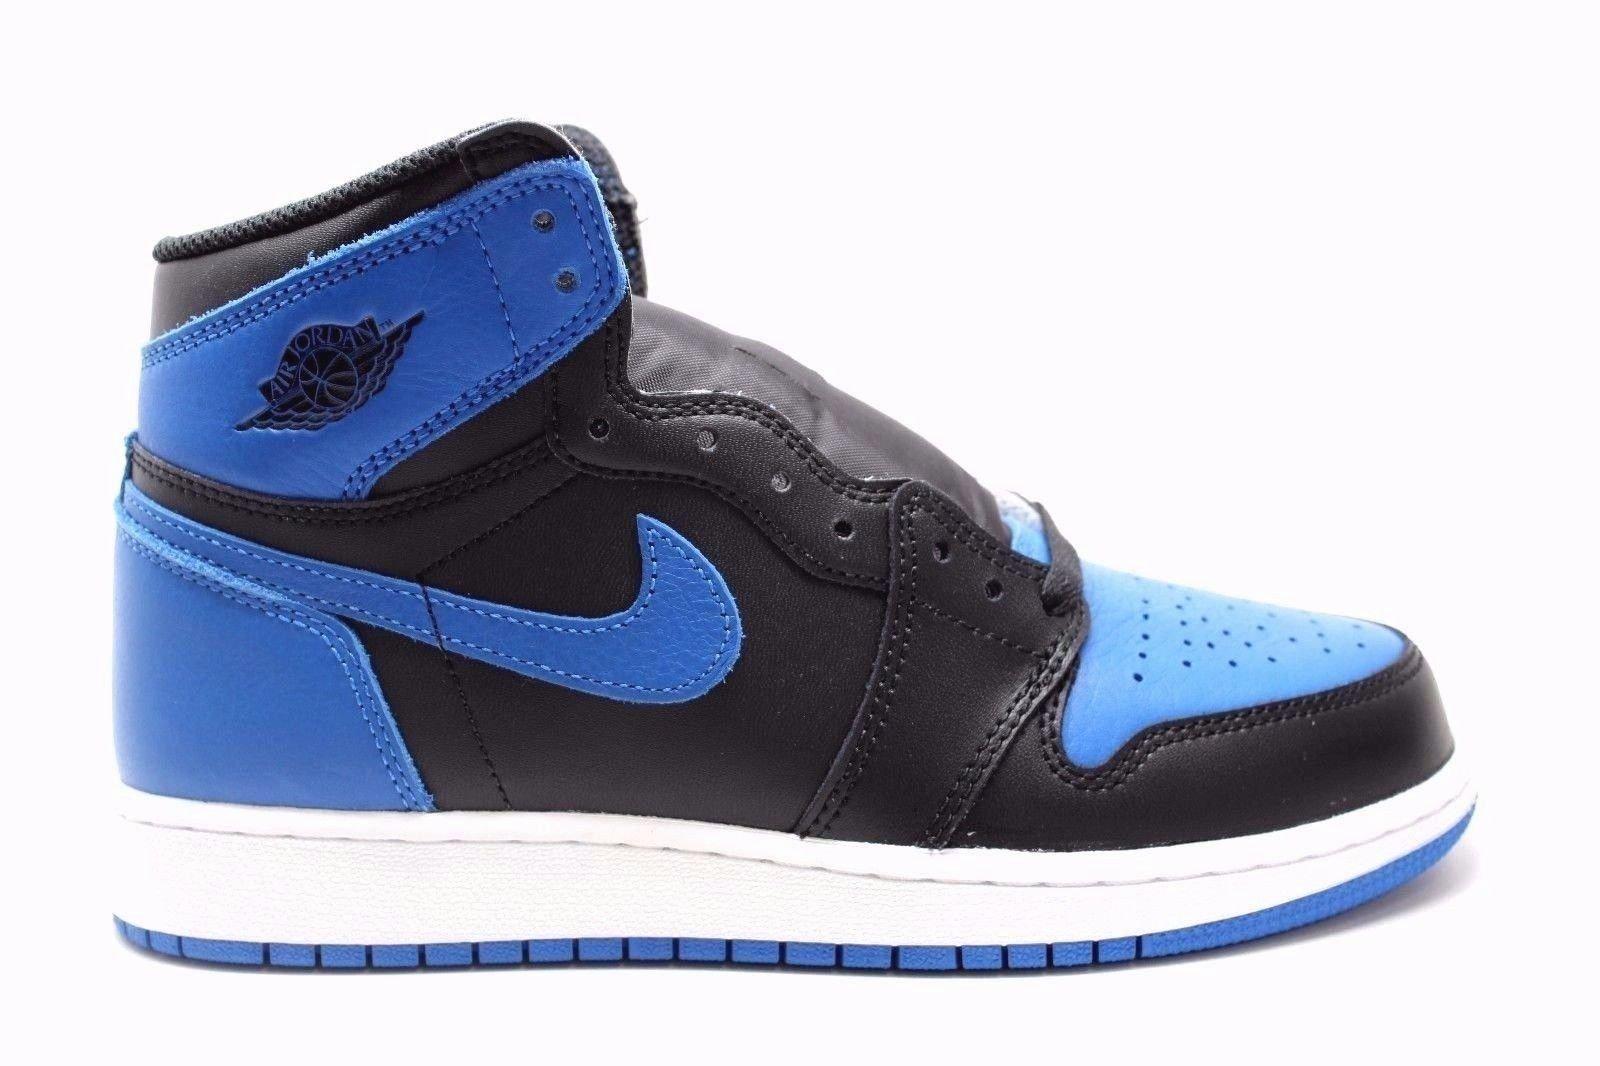 Nike Kid's Air Jordan AJ 1 Retro OG High Top Shoe, Black/Royal/White, 6 M US Big Kid